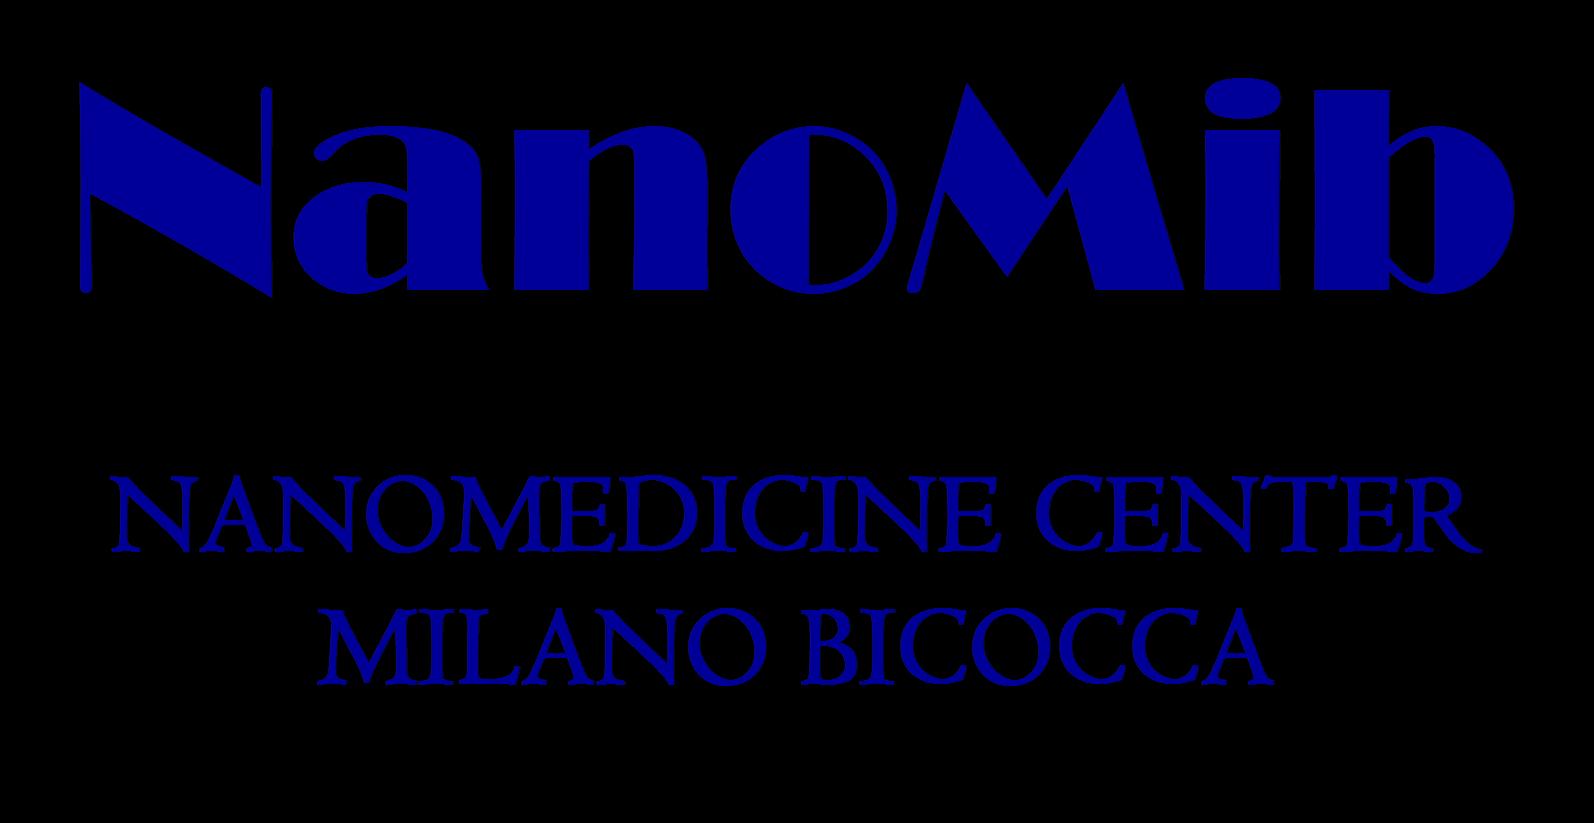 BioNanoMedicine Center